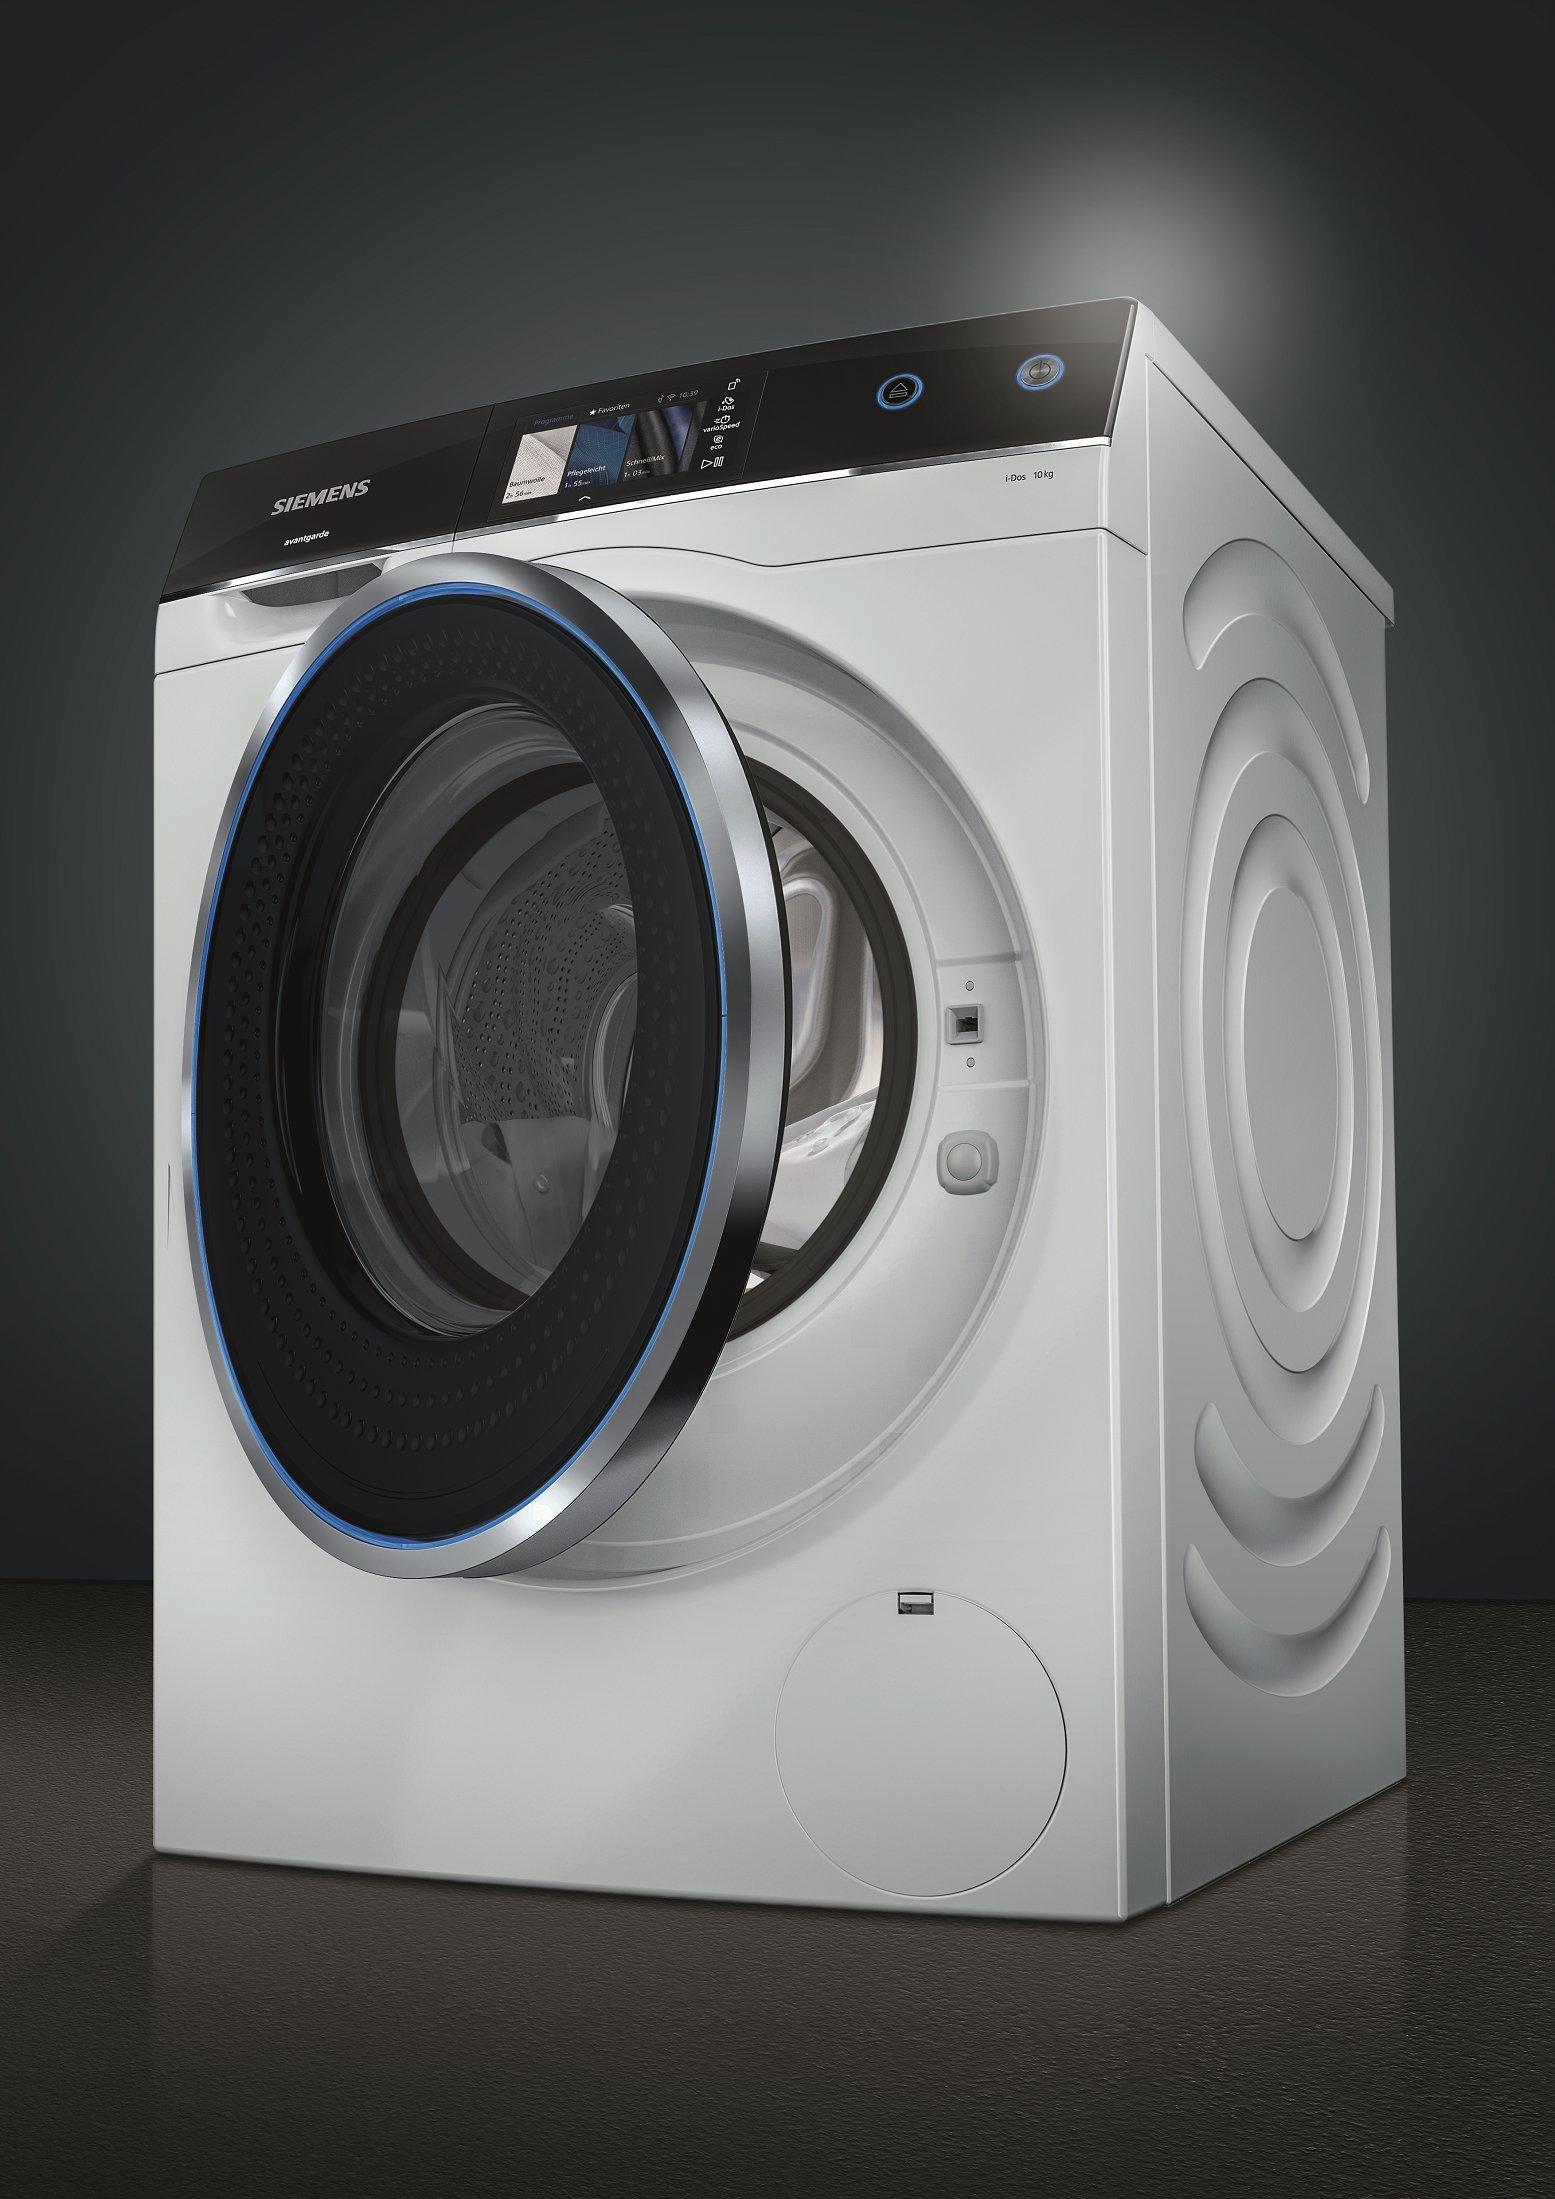 Siemens-avantgarde-WM14U840EU-Waschmaschine-1000-kg-A-143-kWh-1400-Umin-Dosierautomatik-iDos-WLAN-fhig-mit-Home-Connect-Automatische-Fleckenautomatik